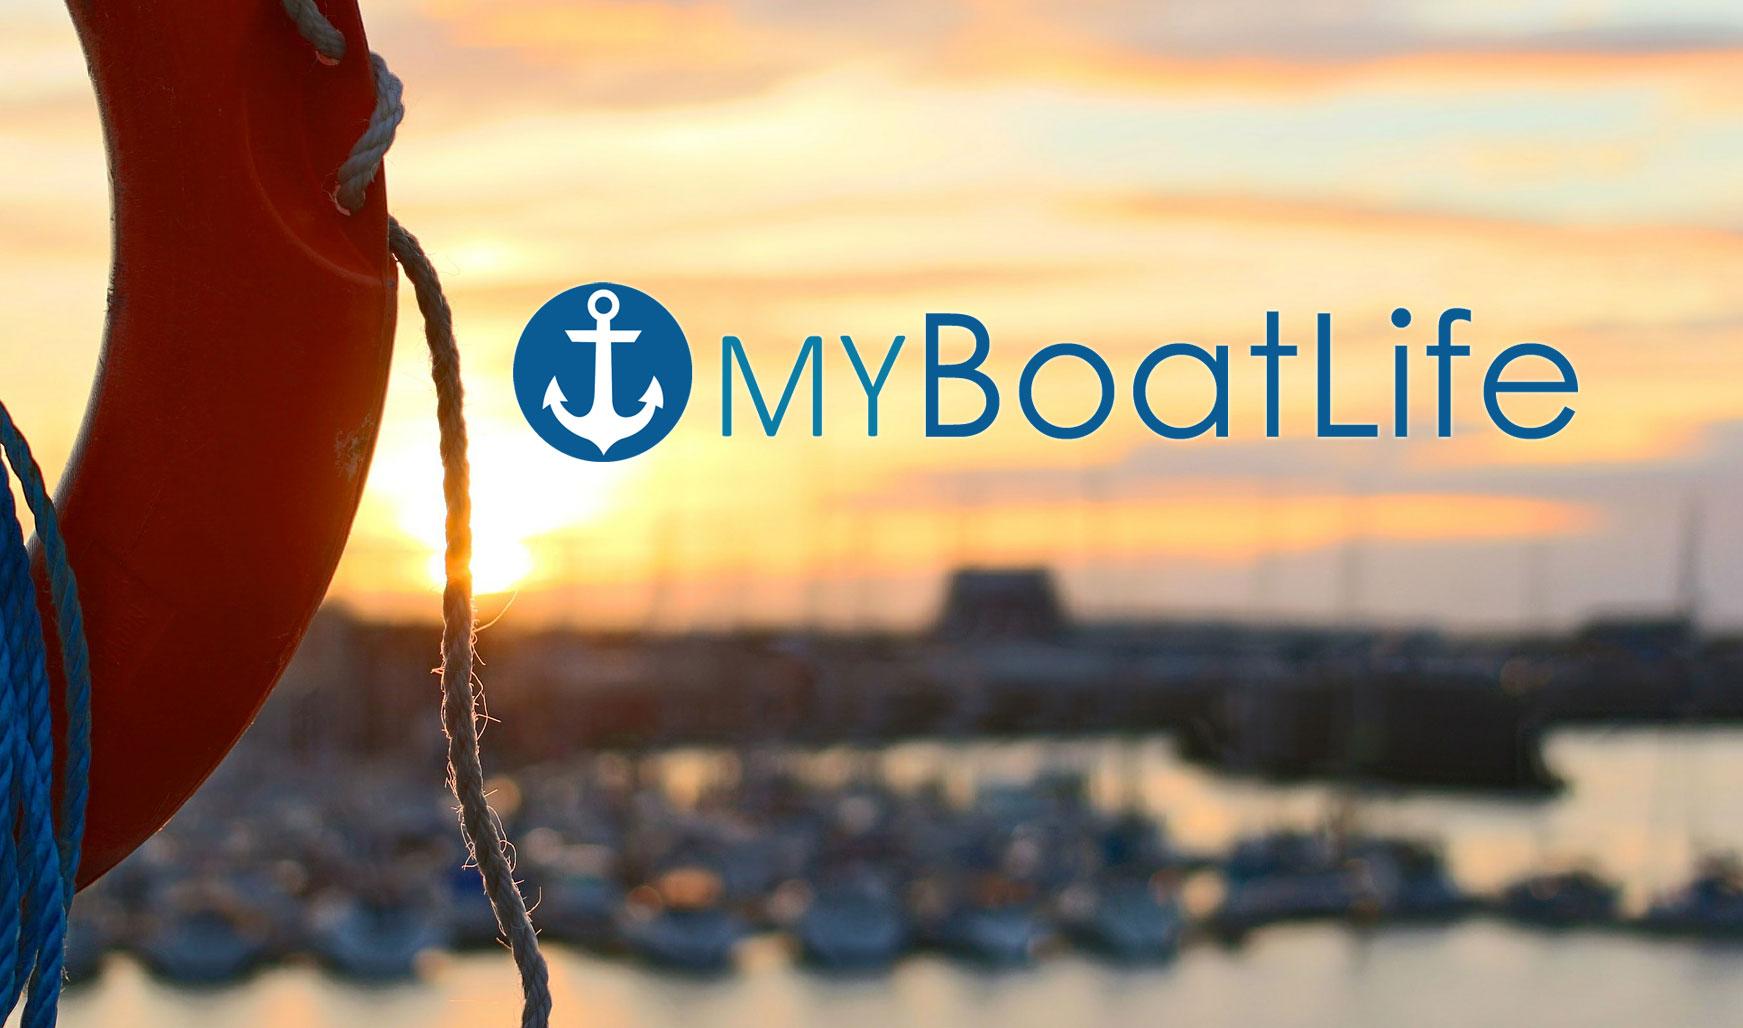 MyBoatLife.com